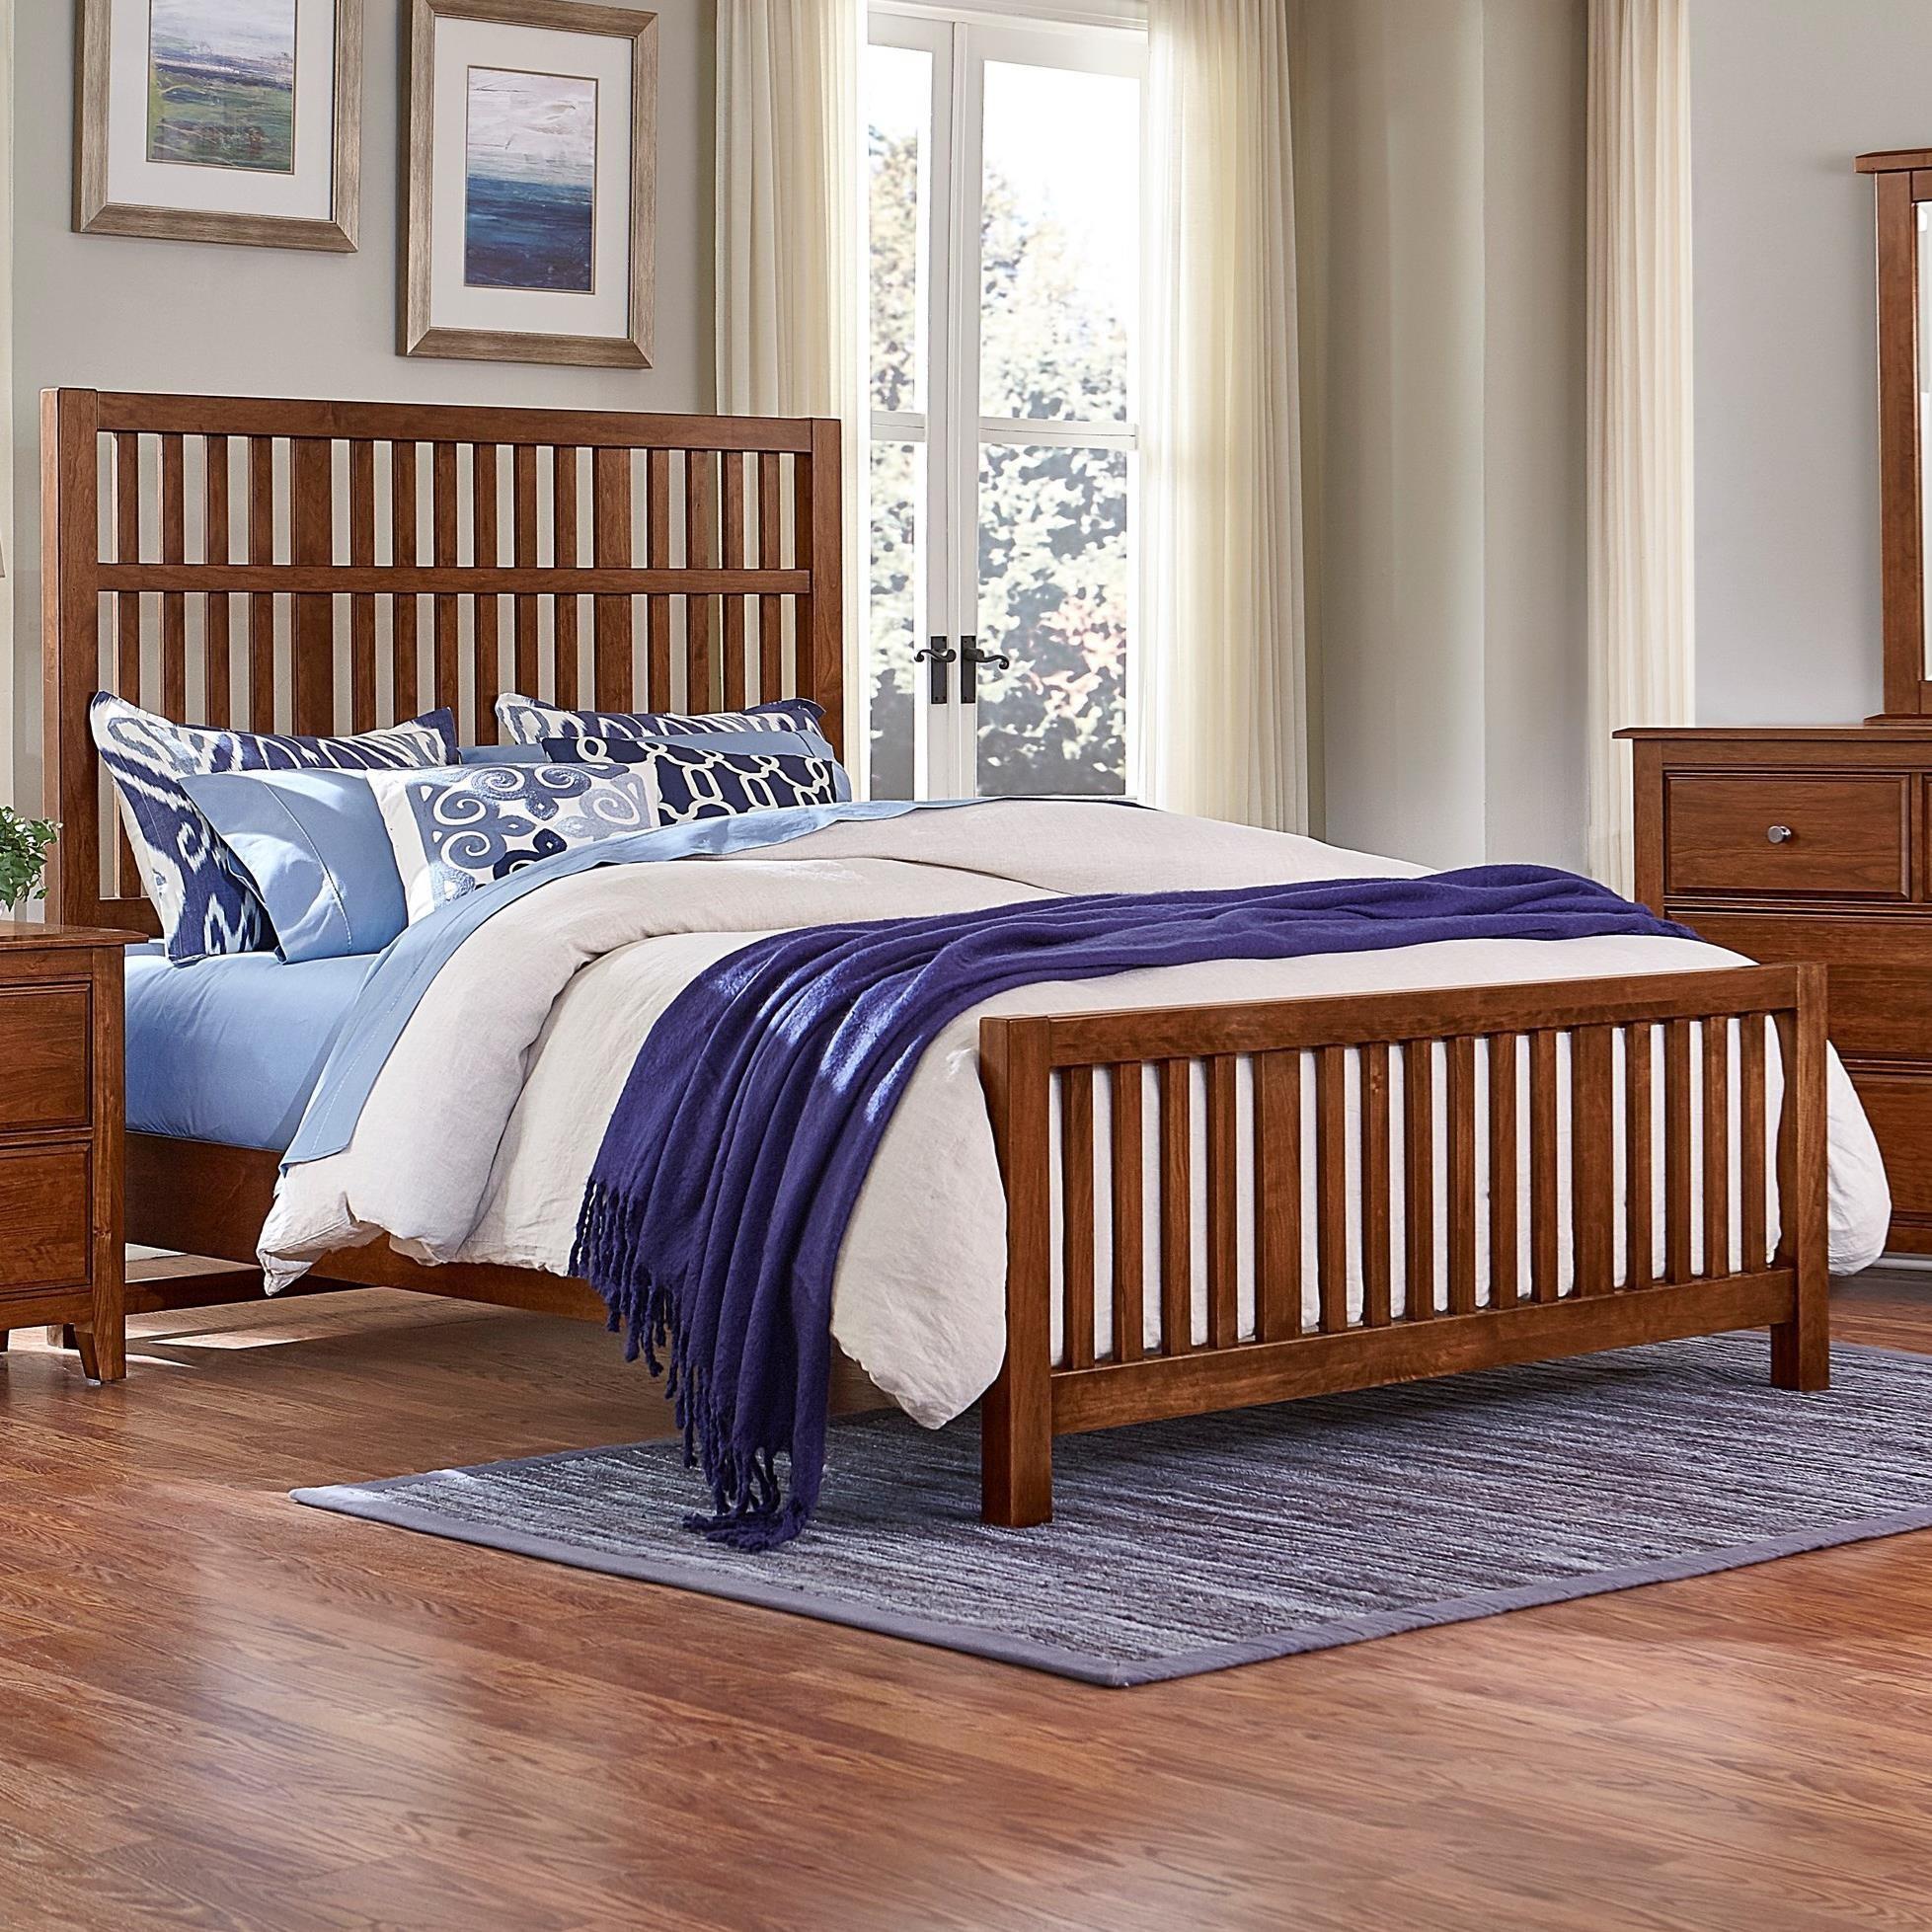 Artisan Choices Queen Craftsman Slat Bed by Artisan & Post at Lapeer Furniture & Mattress Center